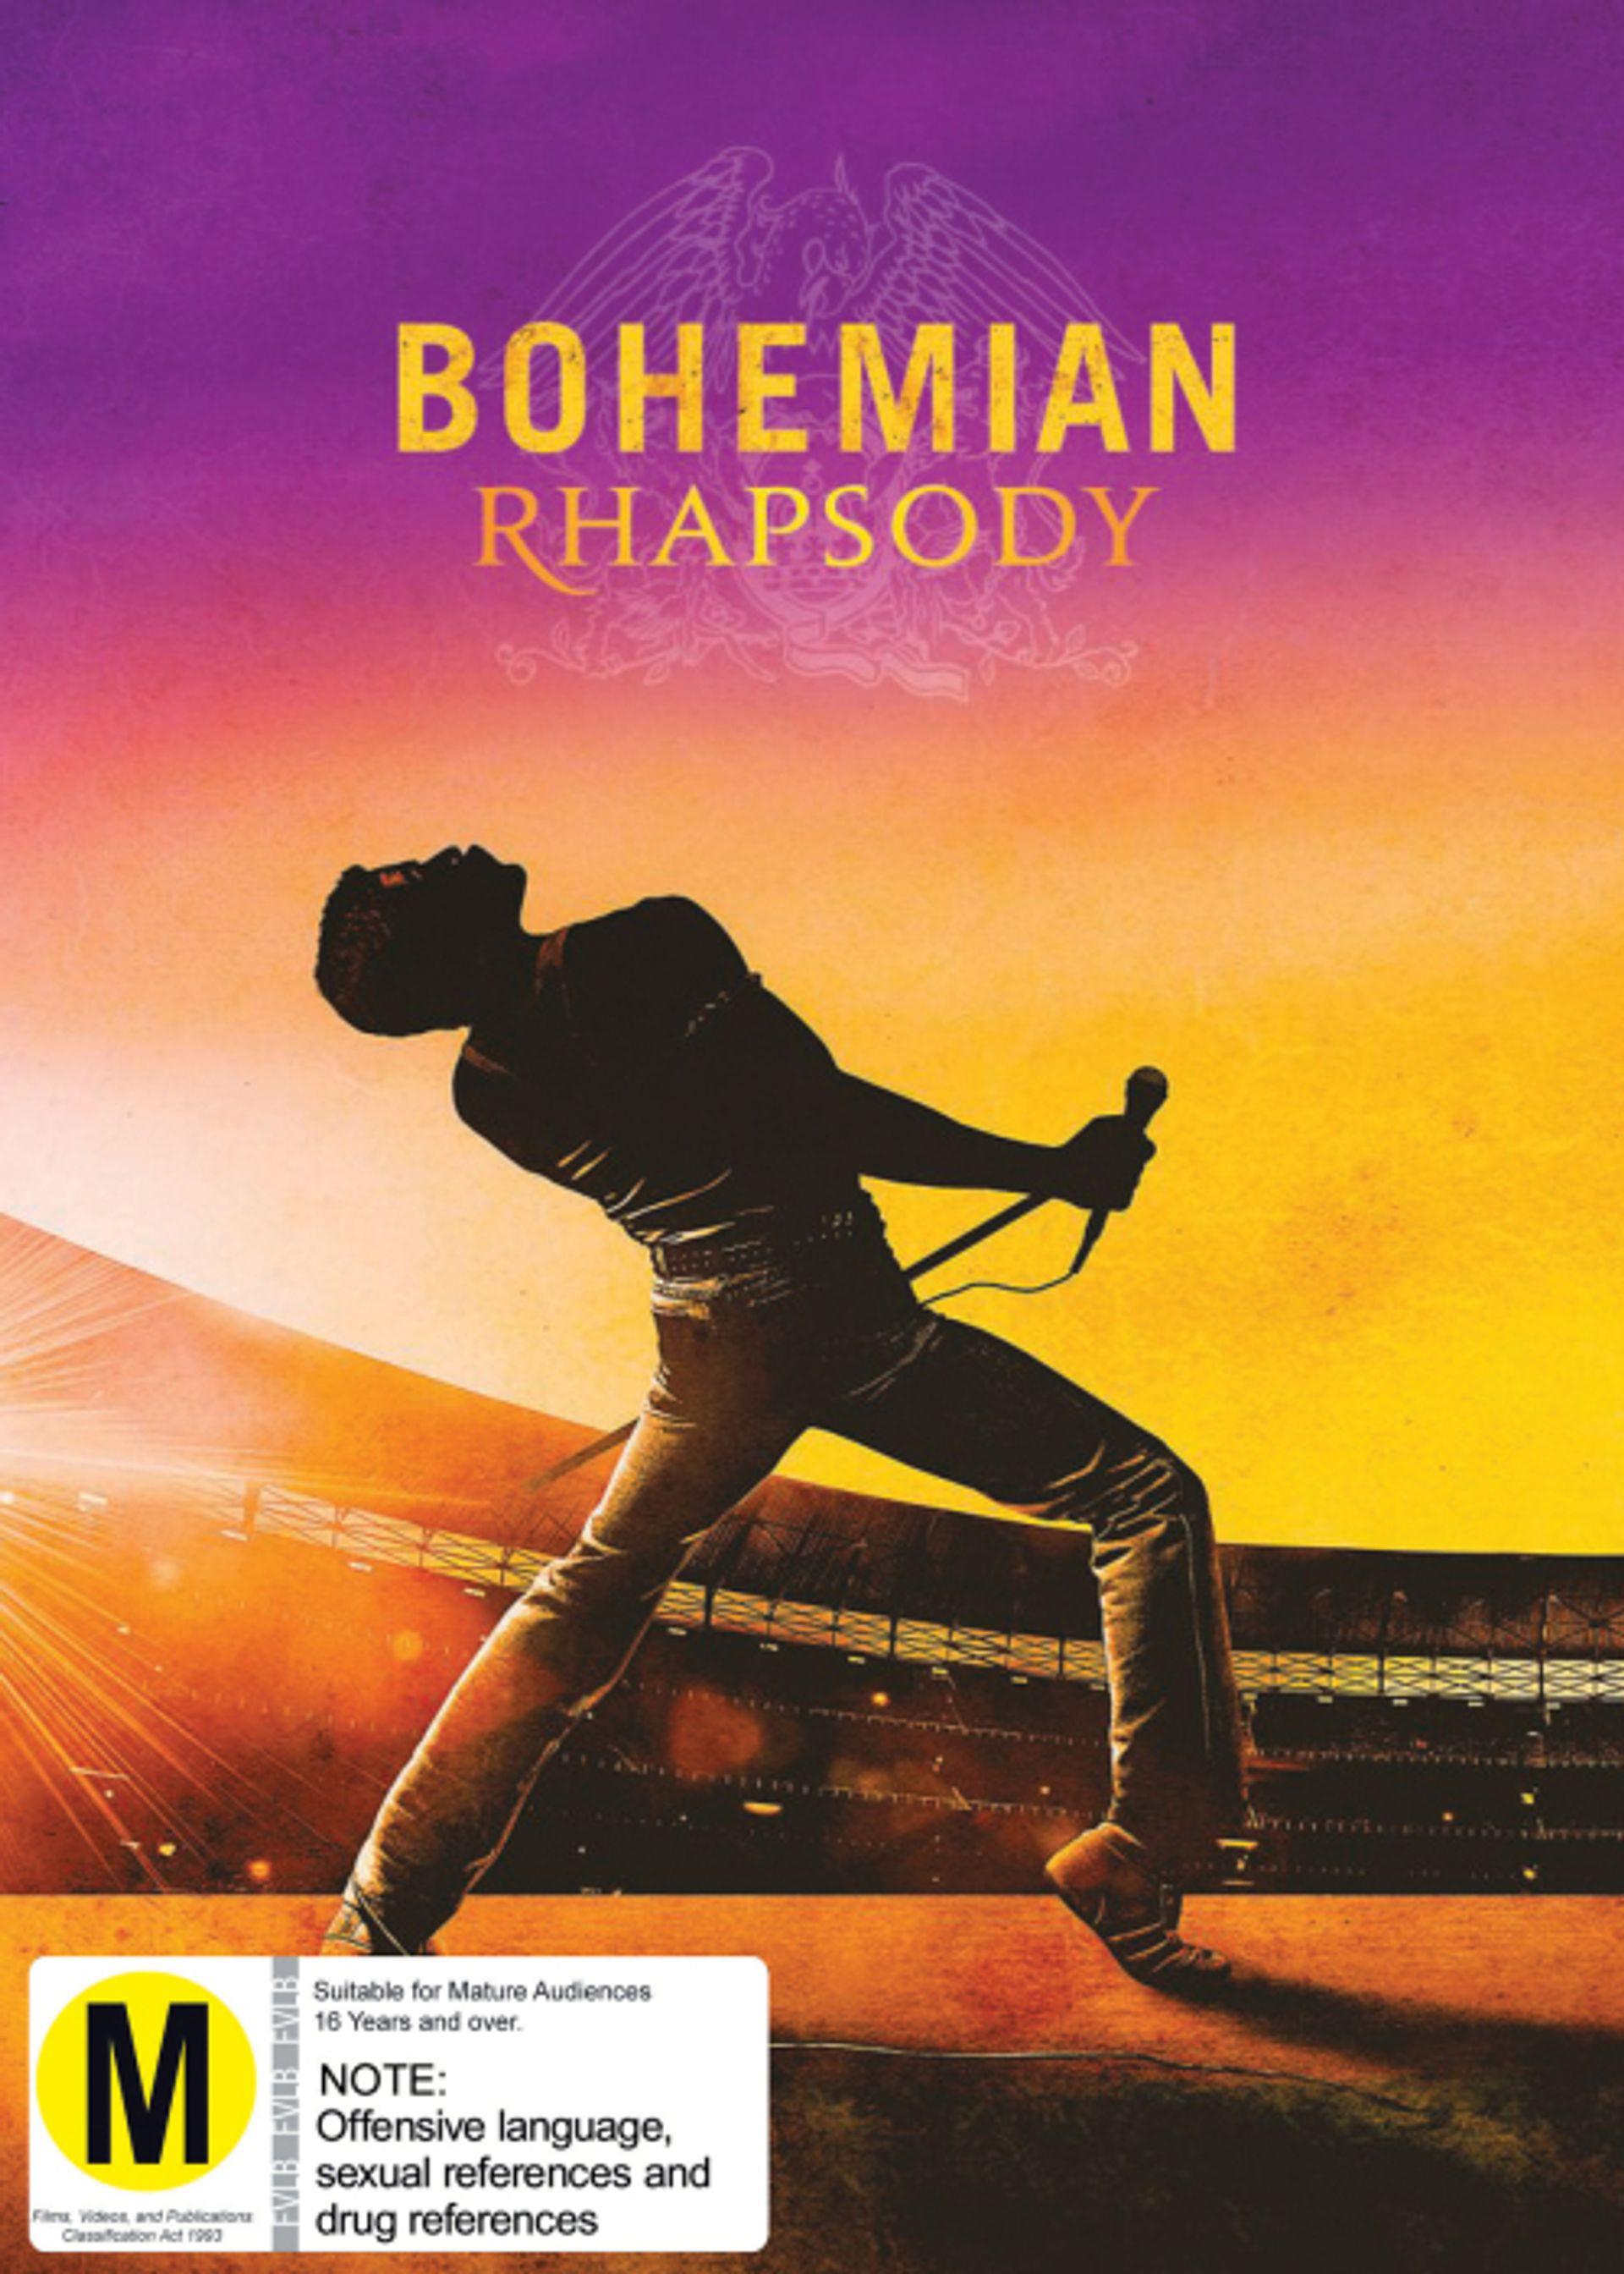 Wat maakt Queen-film Bohemian Rhapsody zo goed? Megafan Babet weet het!